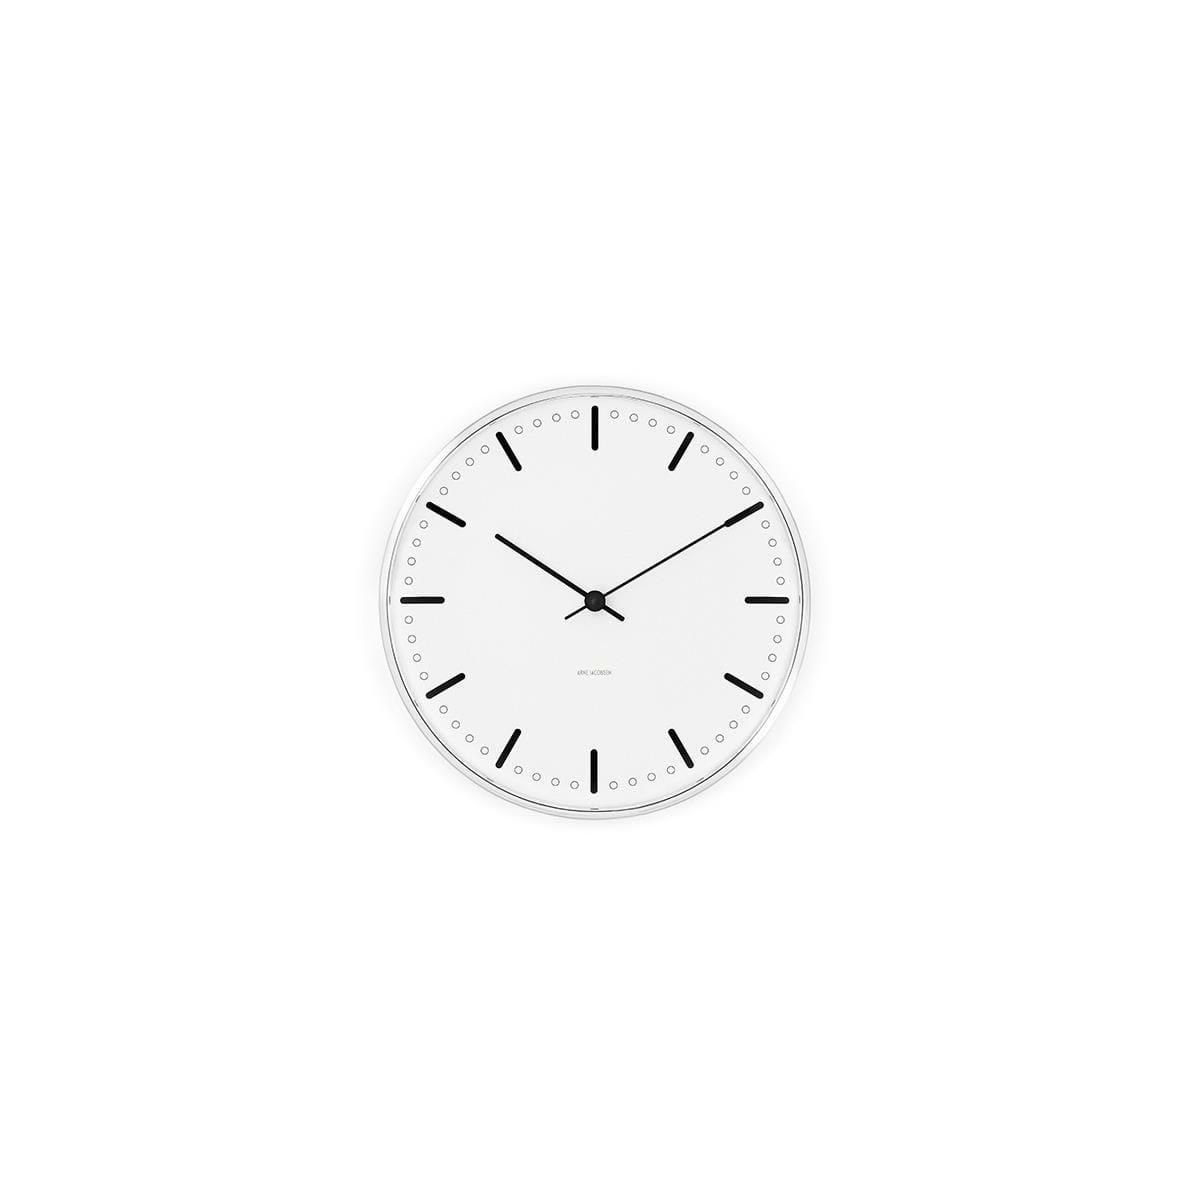 Arne Jacobsen - City Hall Wall Clock 16,5 cm - White (43621)